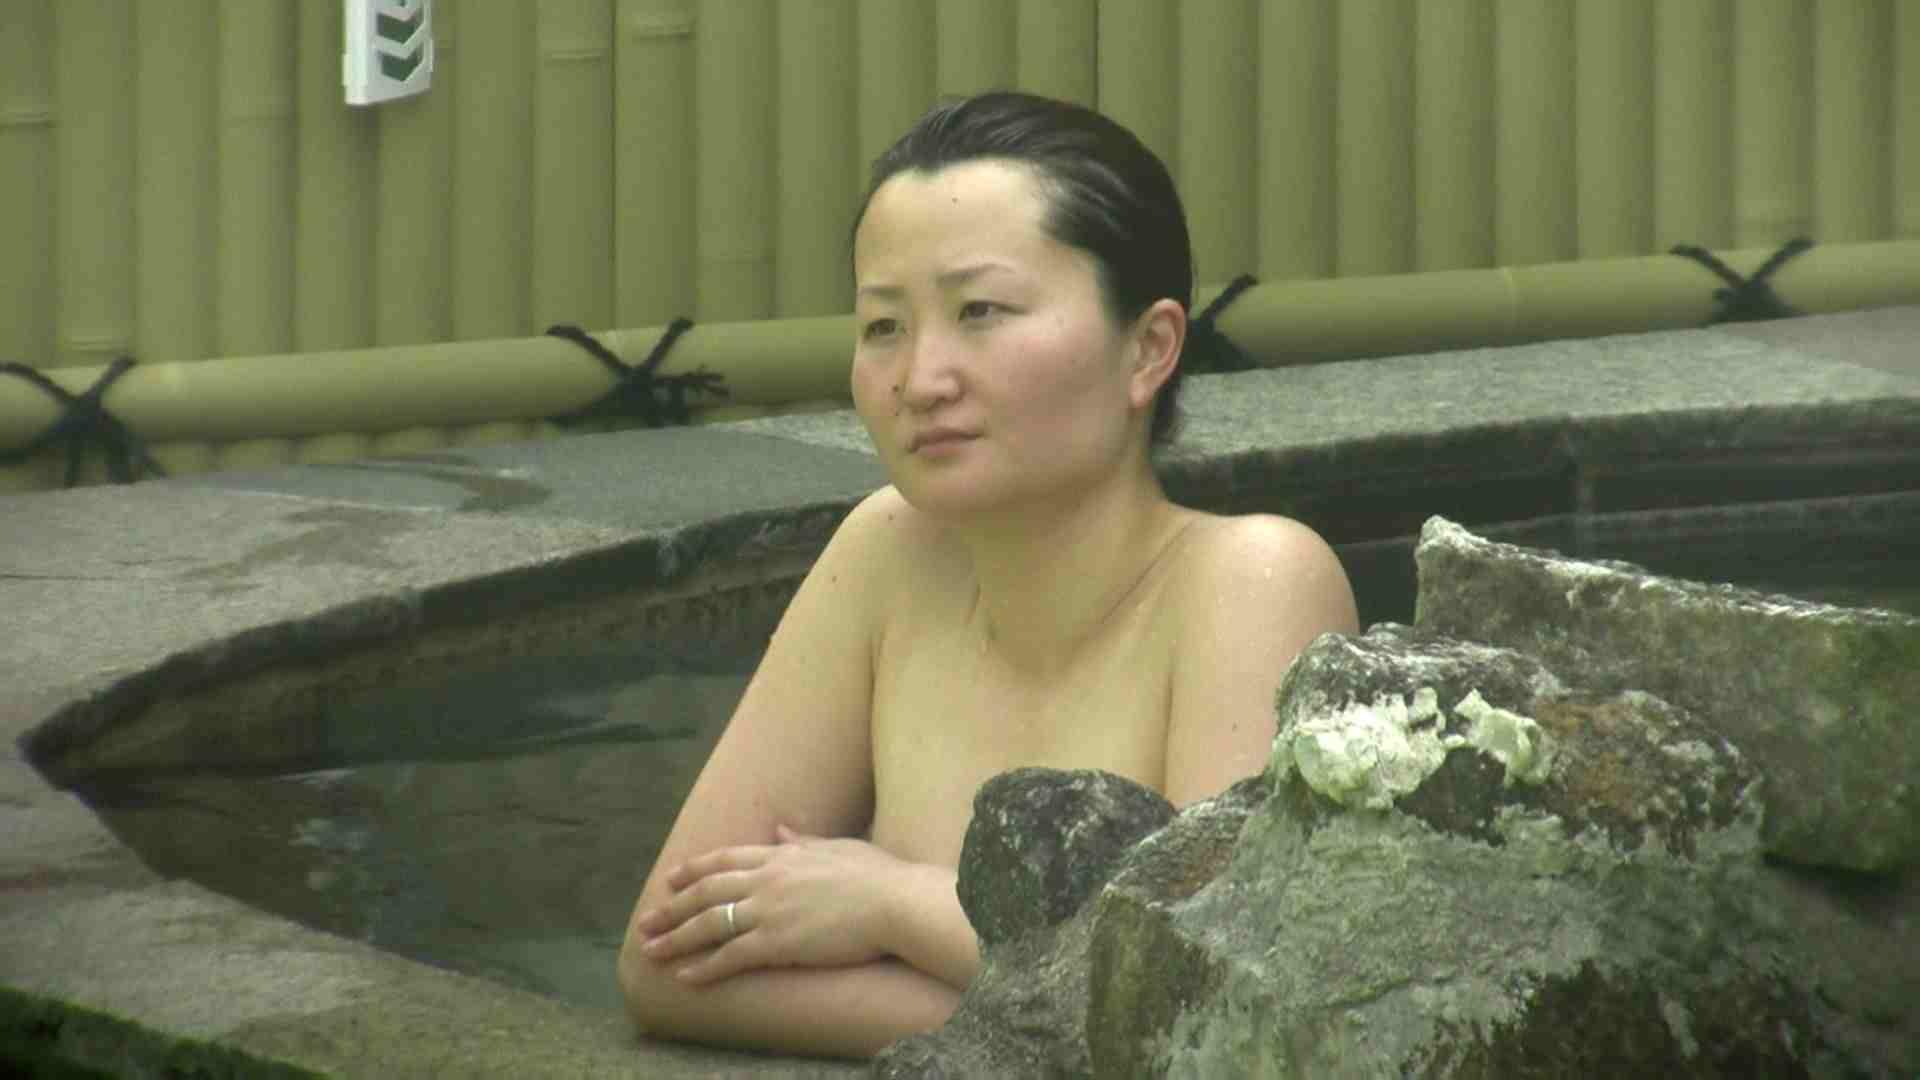 Aquaな露天風呂Vol.632 盗撮シリーズ | 露天風呂編  100PIX 13